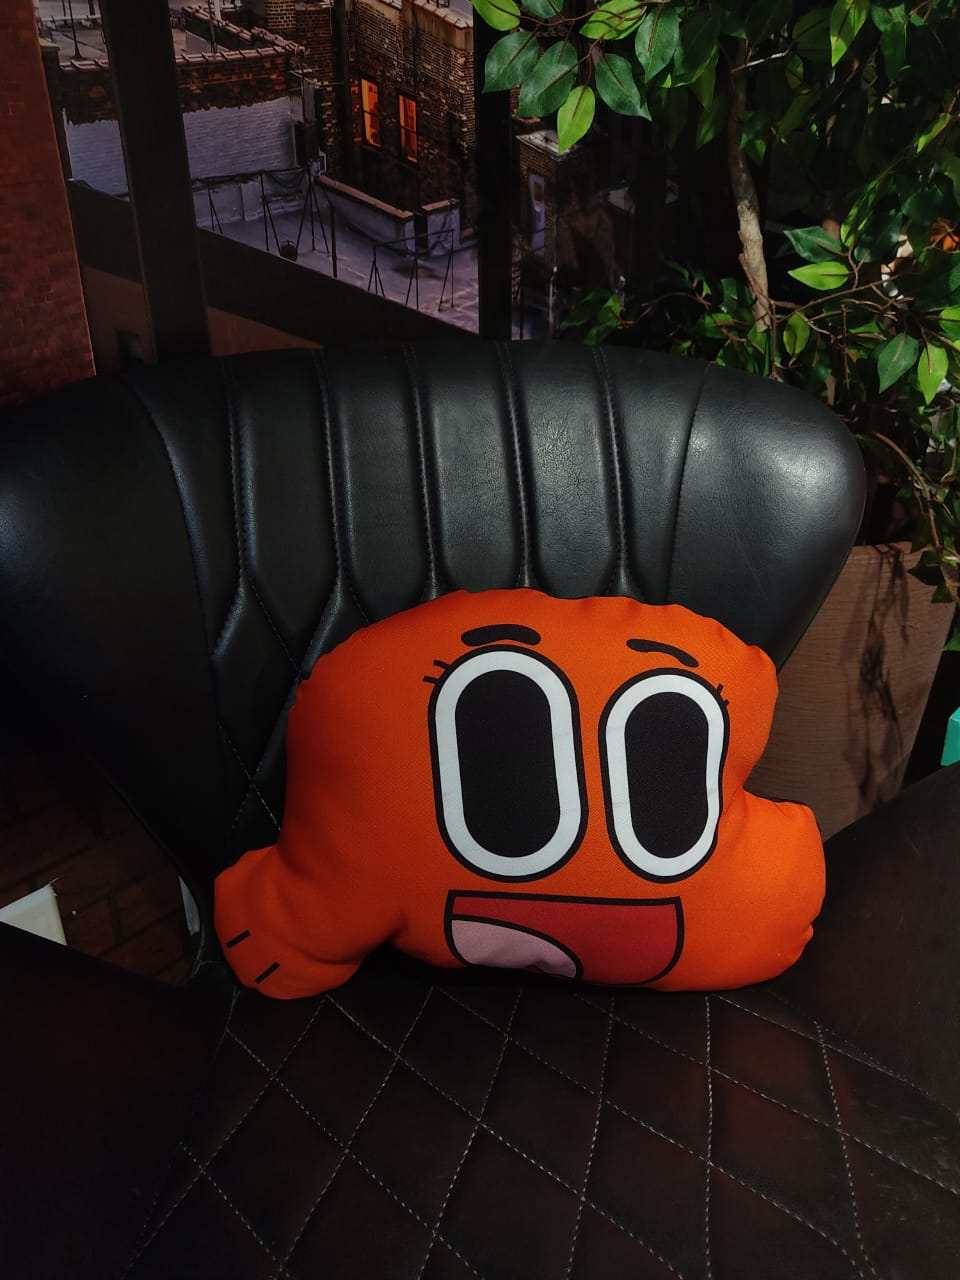 Almofada Rosto  do Darwin: O Incrivel Mundo De Gumball - Cartoon Network - Pequeno - 25cm